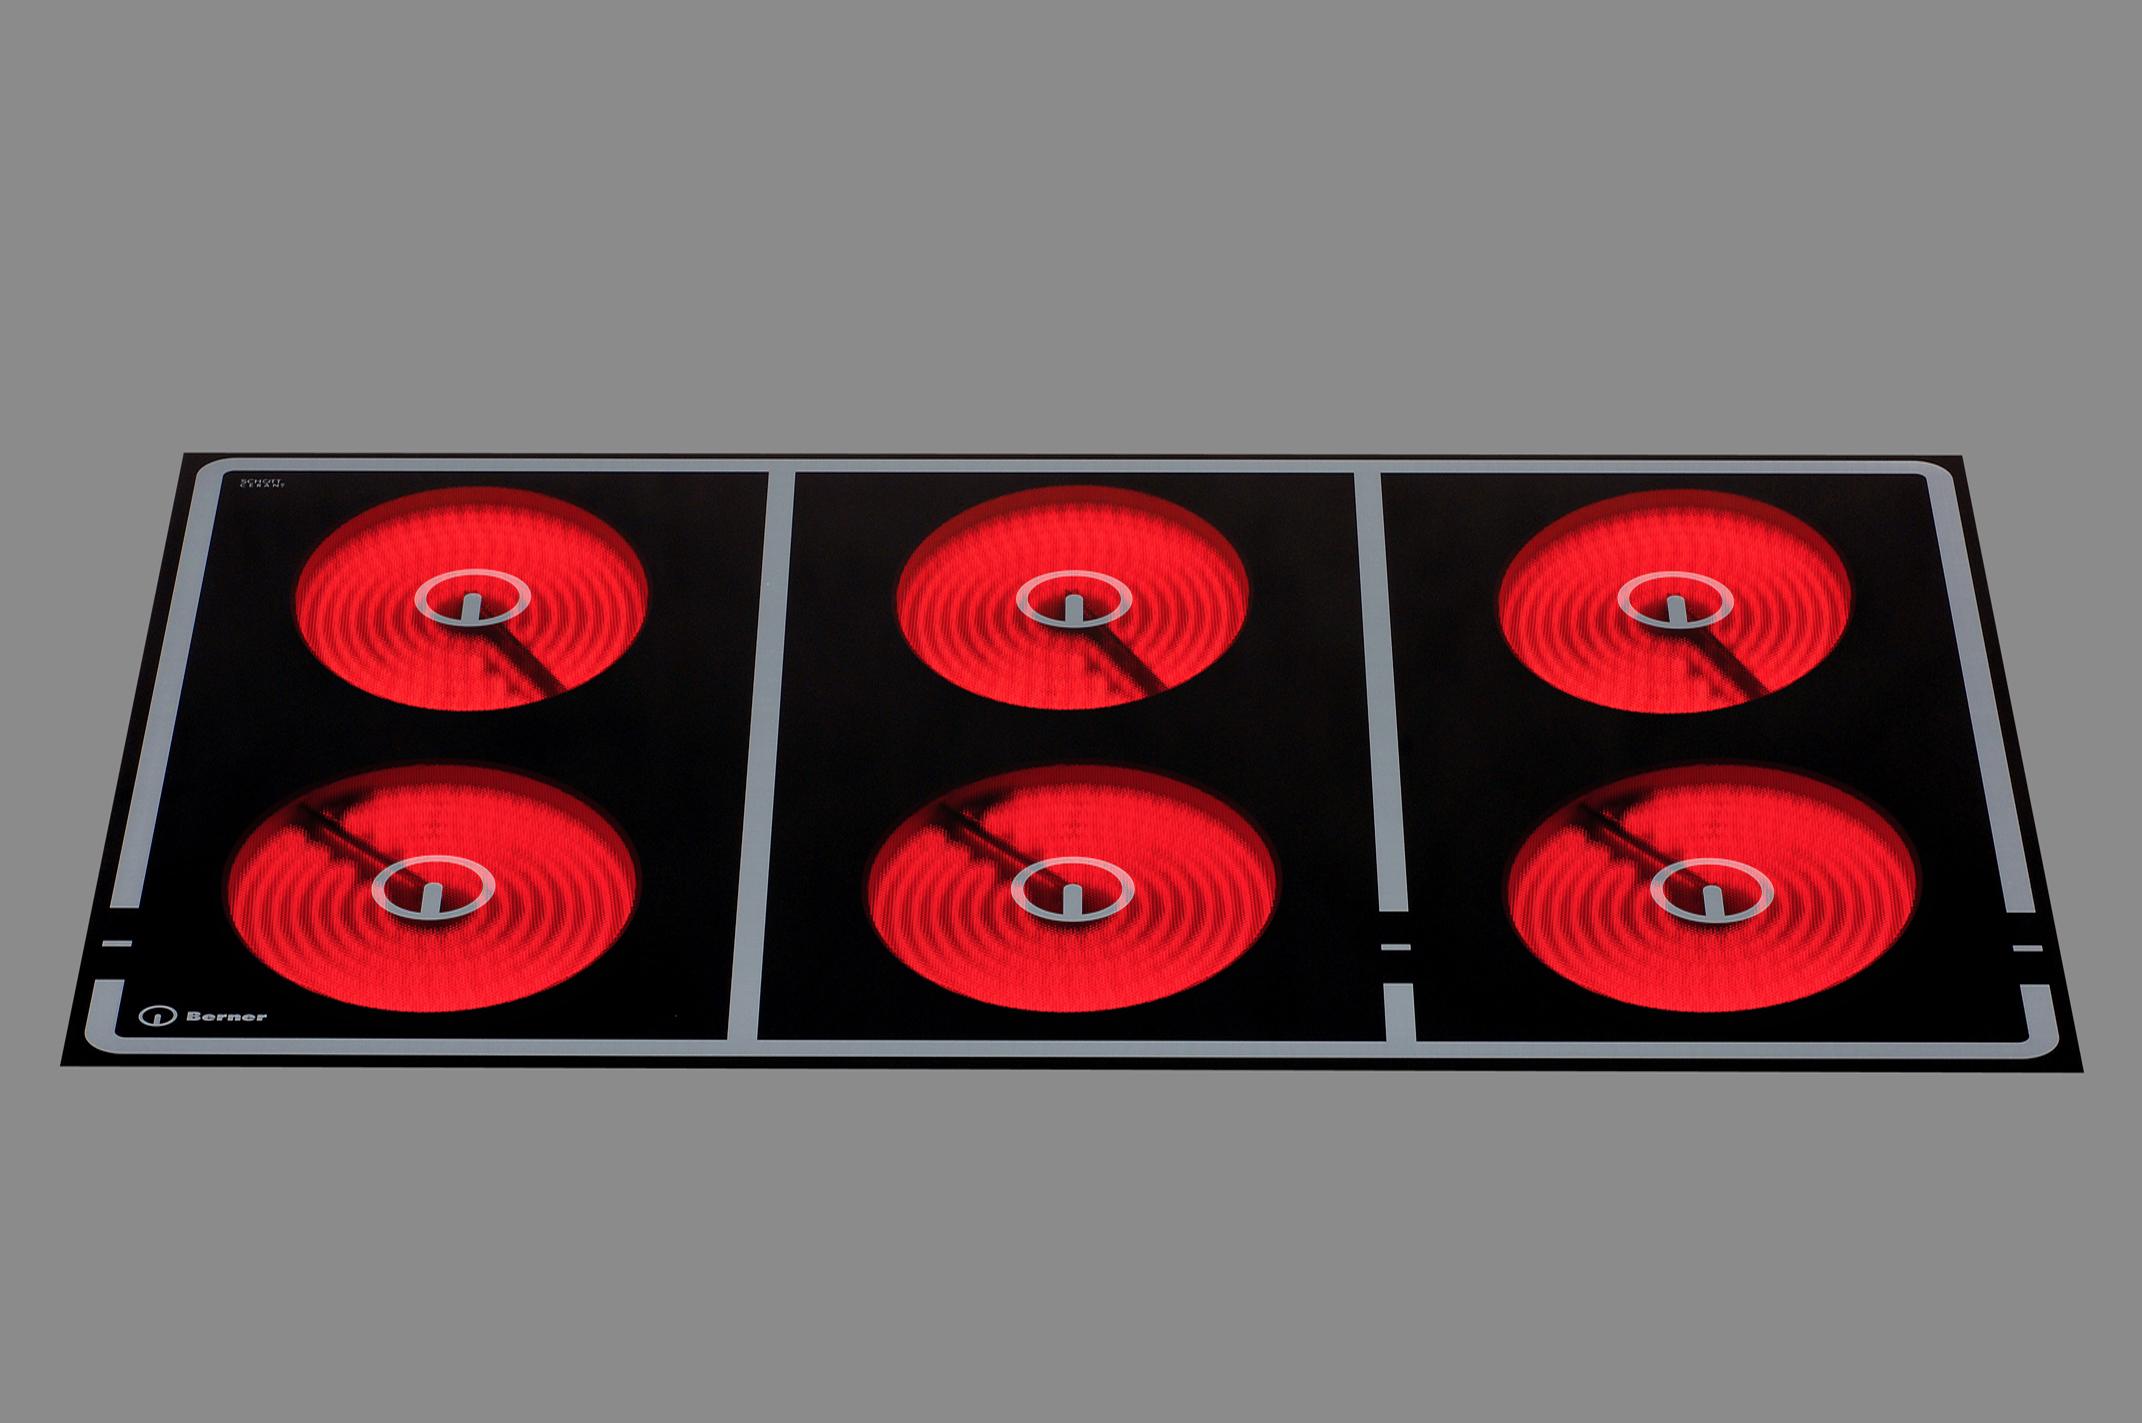 berner bs6zegk zweikreis kochfeld glaskeramik mit 6. Black Bedroom Furniture Sets. Home Design Ideas